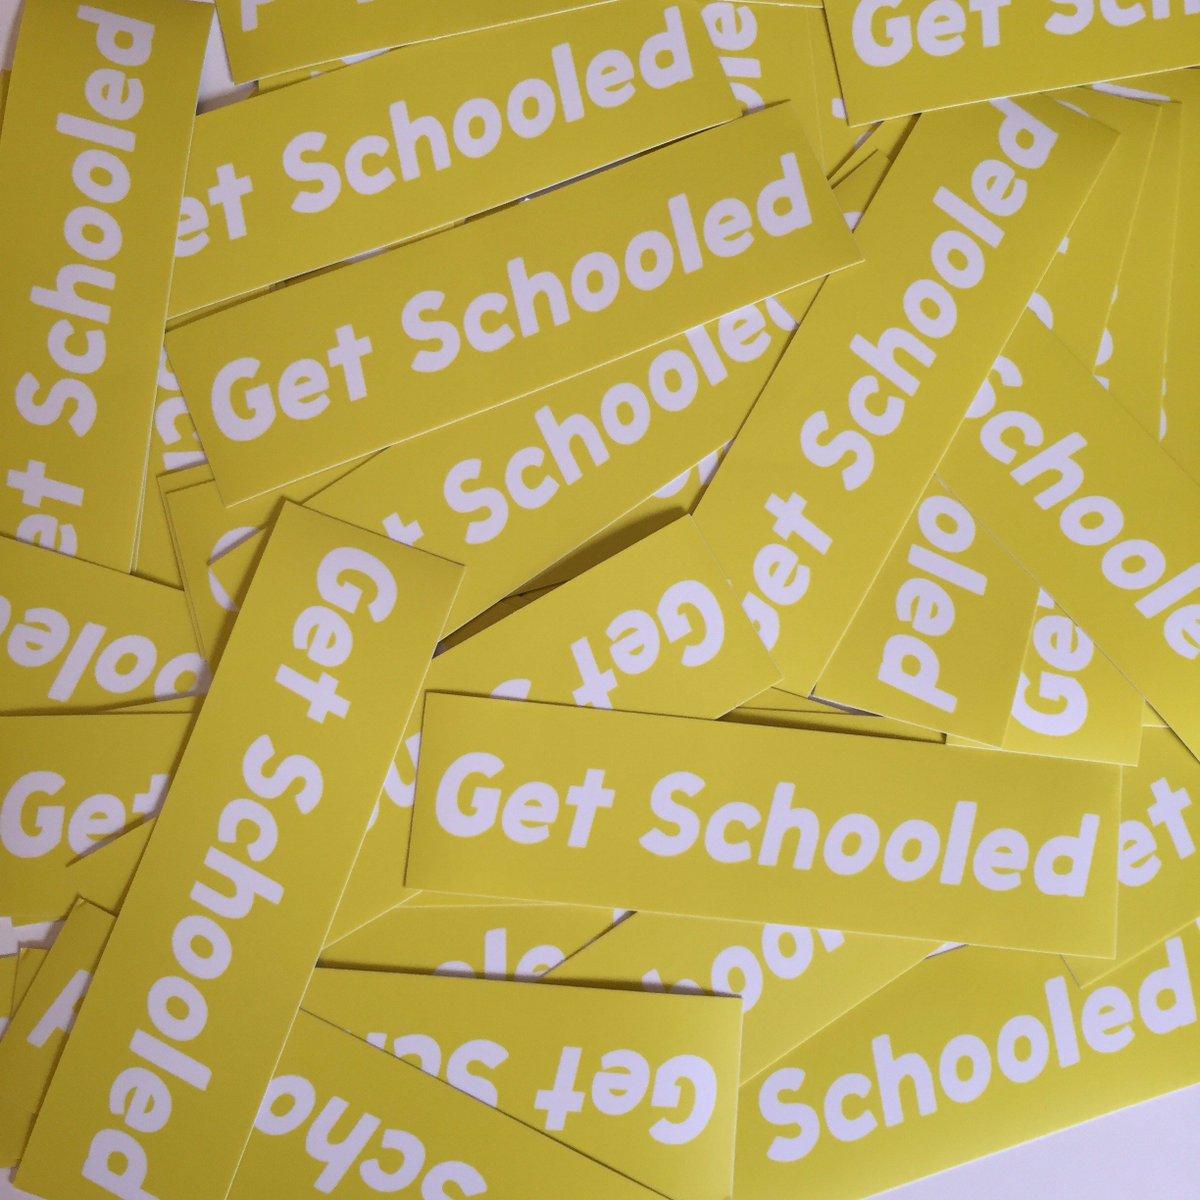 New Get Schooled Sticker GIVEAWAY